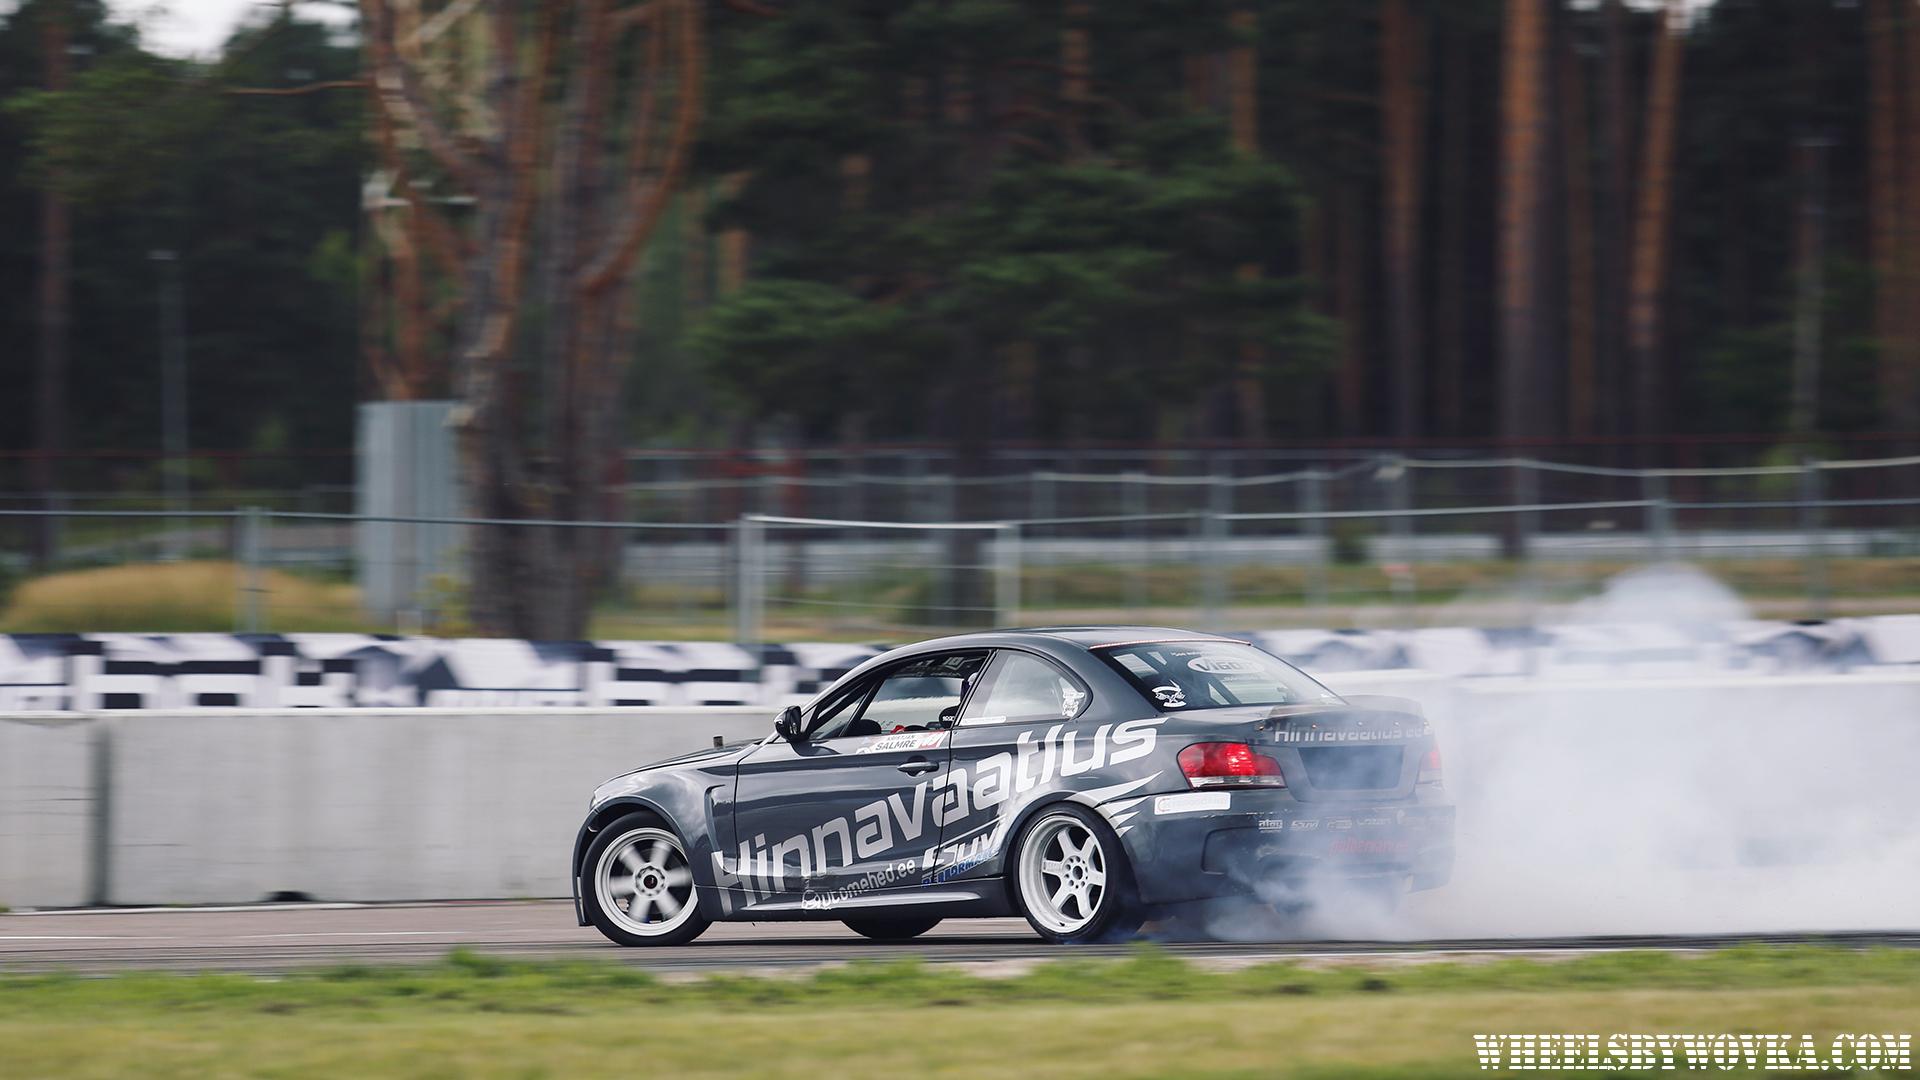 10-years-of-drifting-in-estonia-2018-by-wheelsbywovka-2